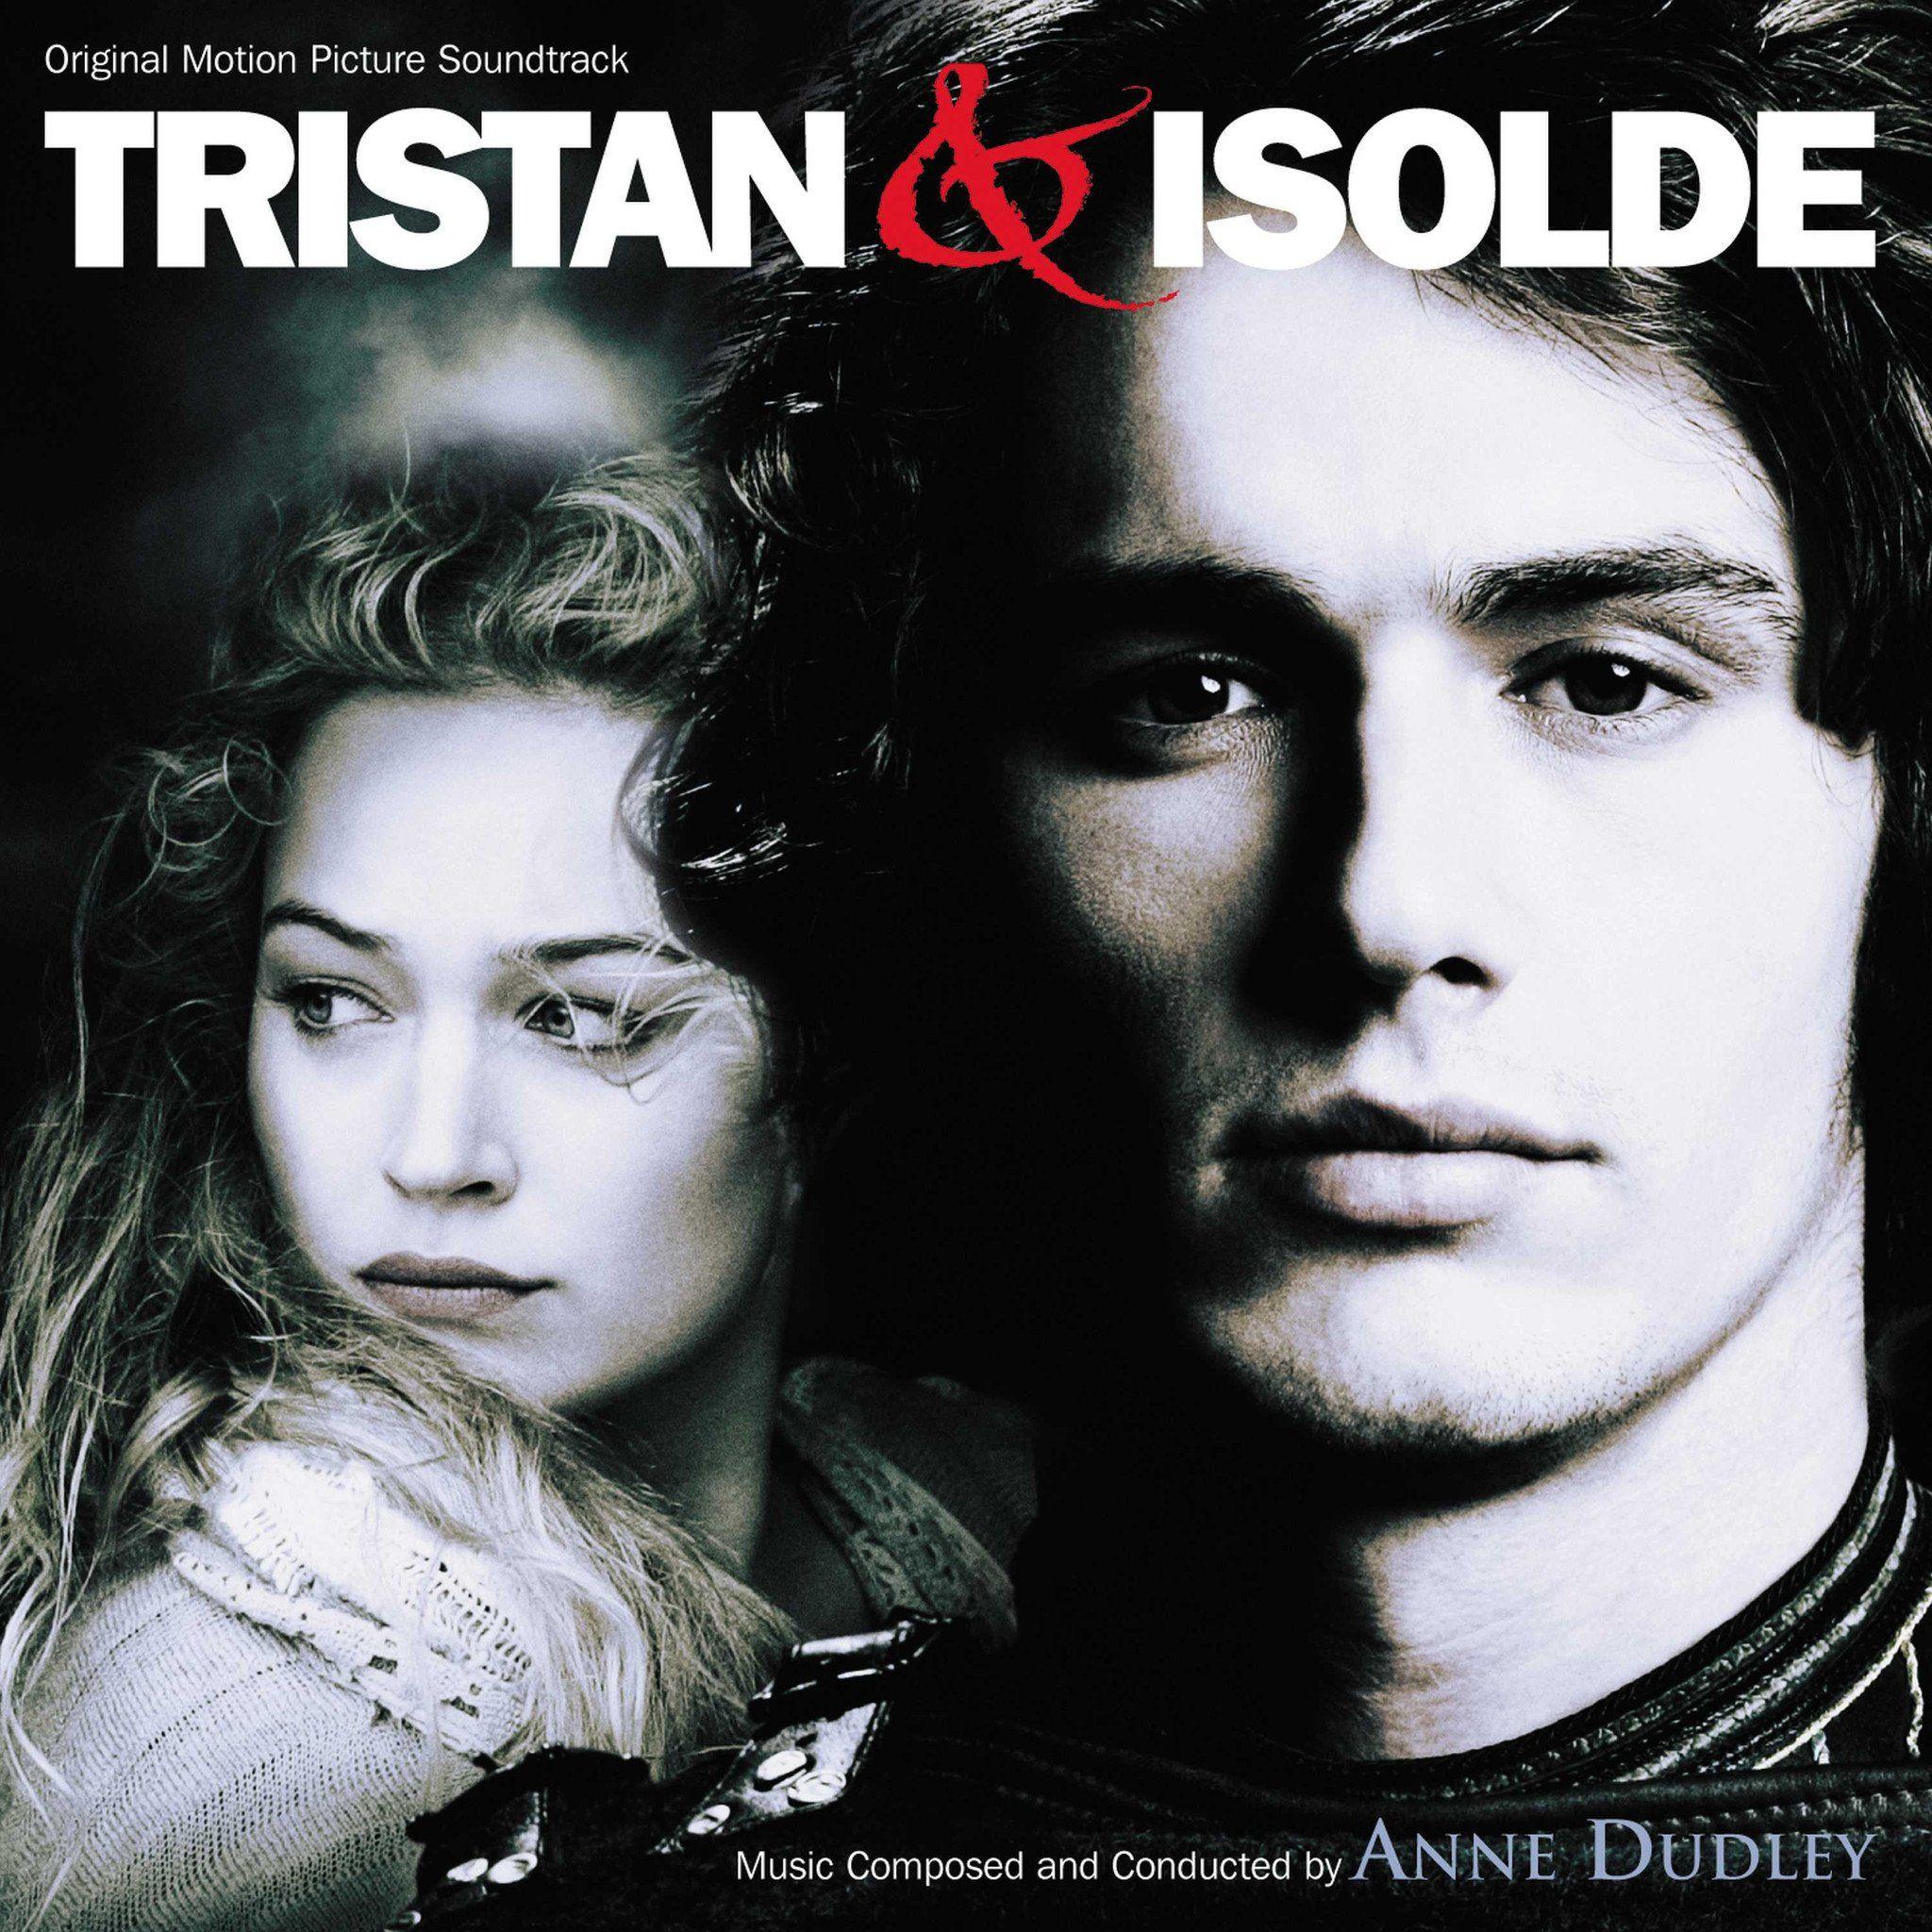 """Tristan & Isolde"" movie soundtrack, 2006. Tristan"